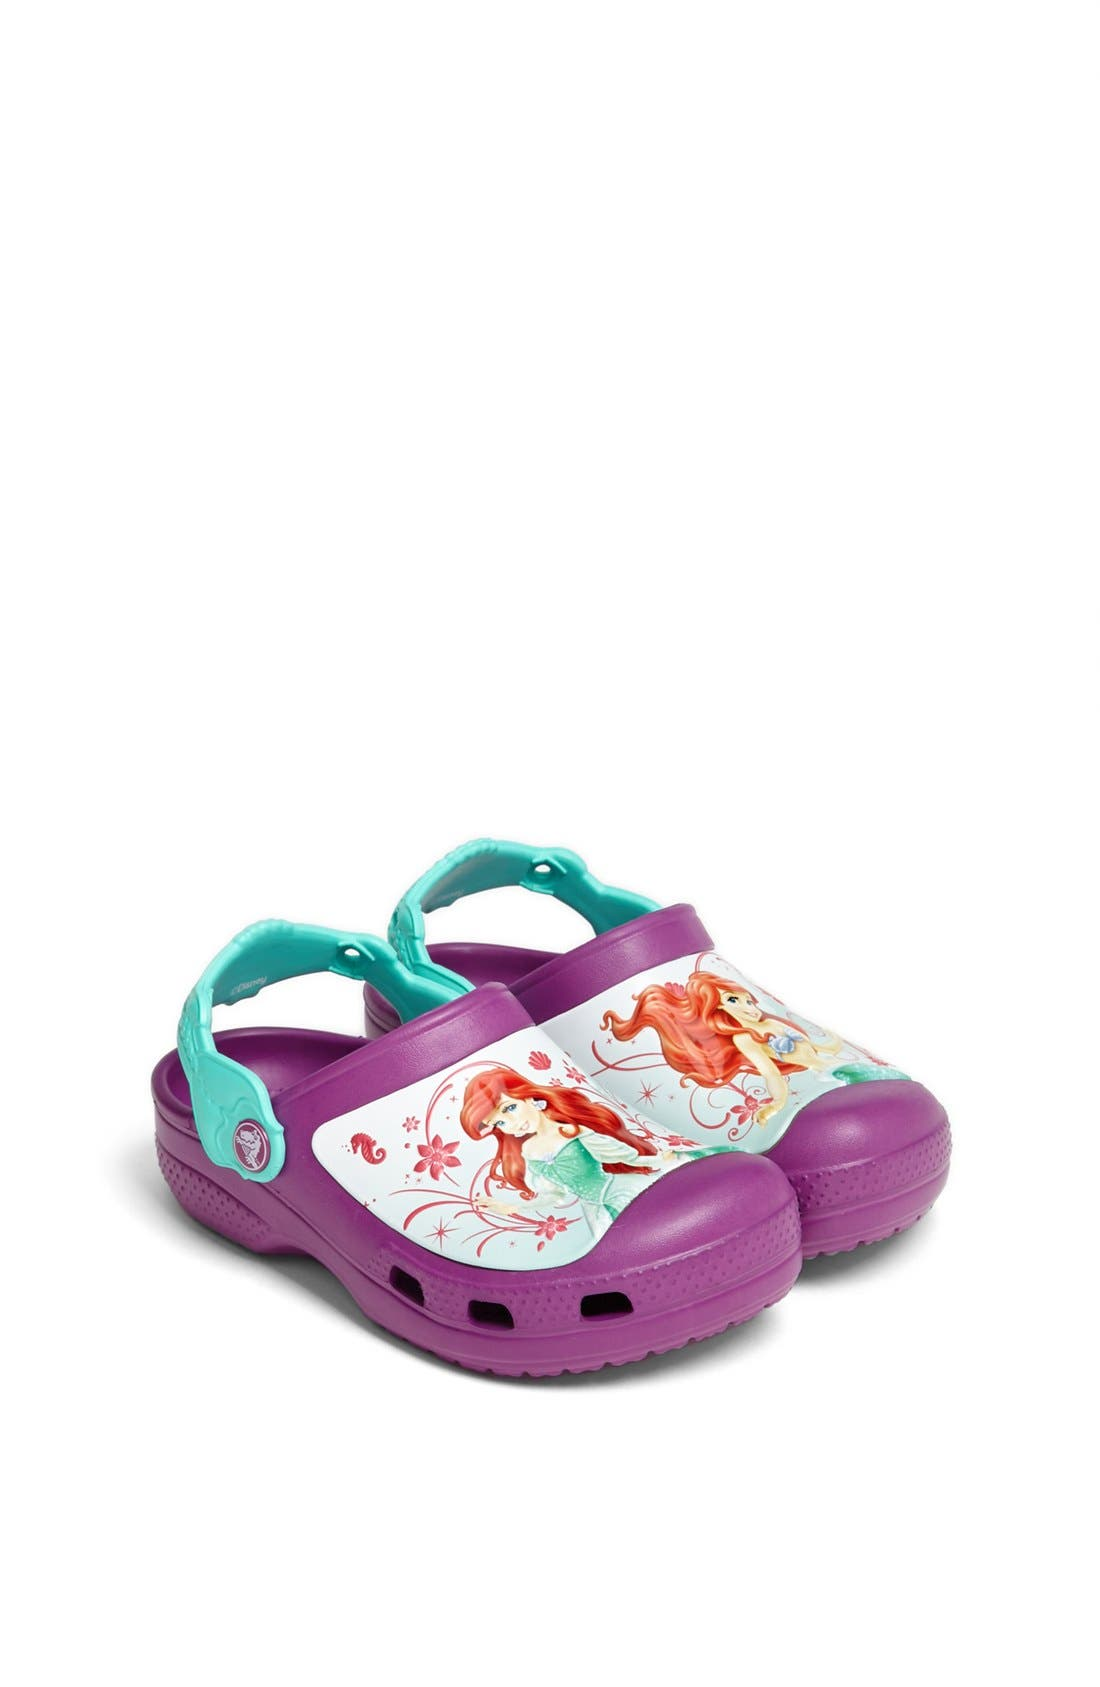 Main Image - CROCS™ 'Ariel' Clog (Walker, Toddler &  Little Kid)